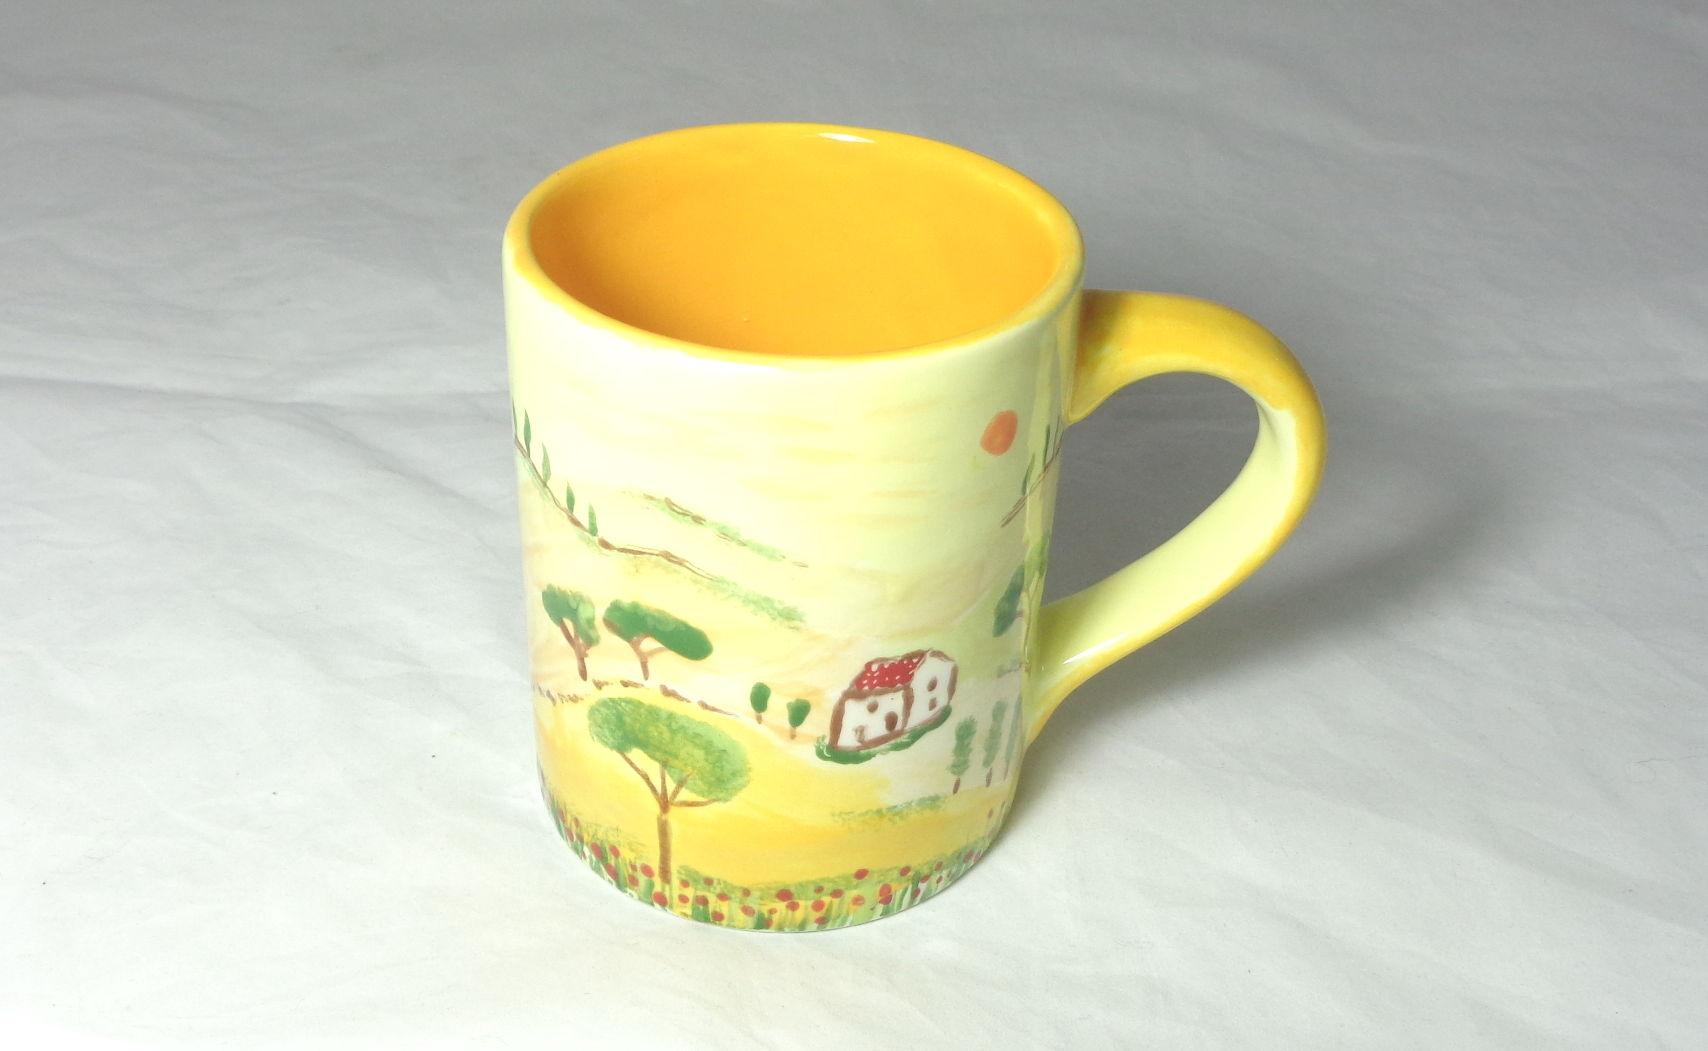 Bemalte Keramik Kaffeebecher Toskana